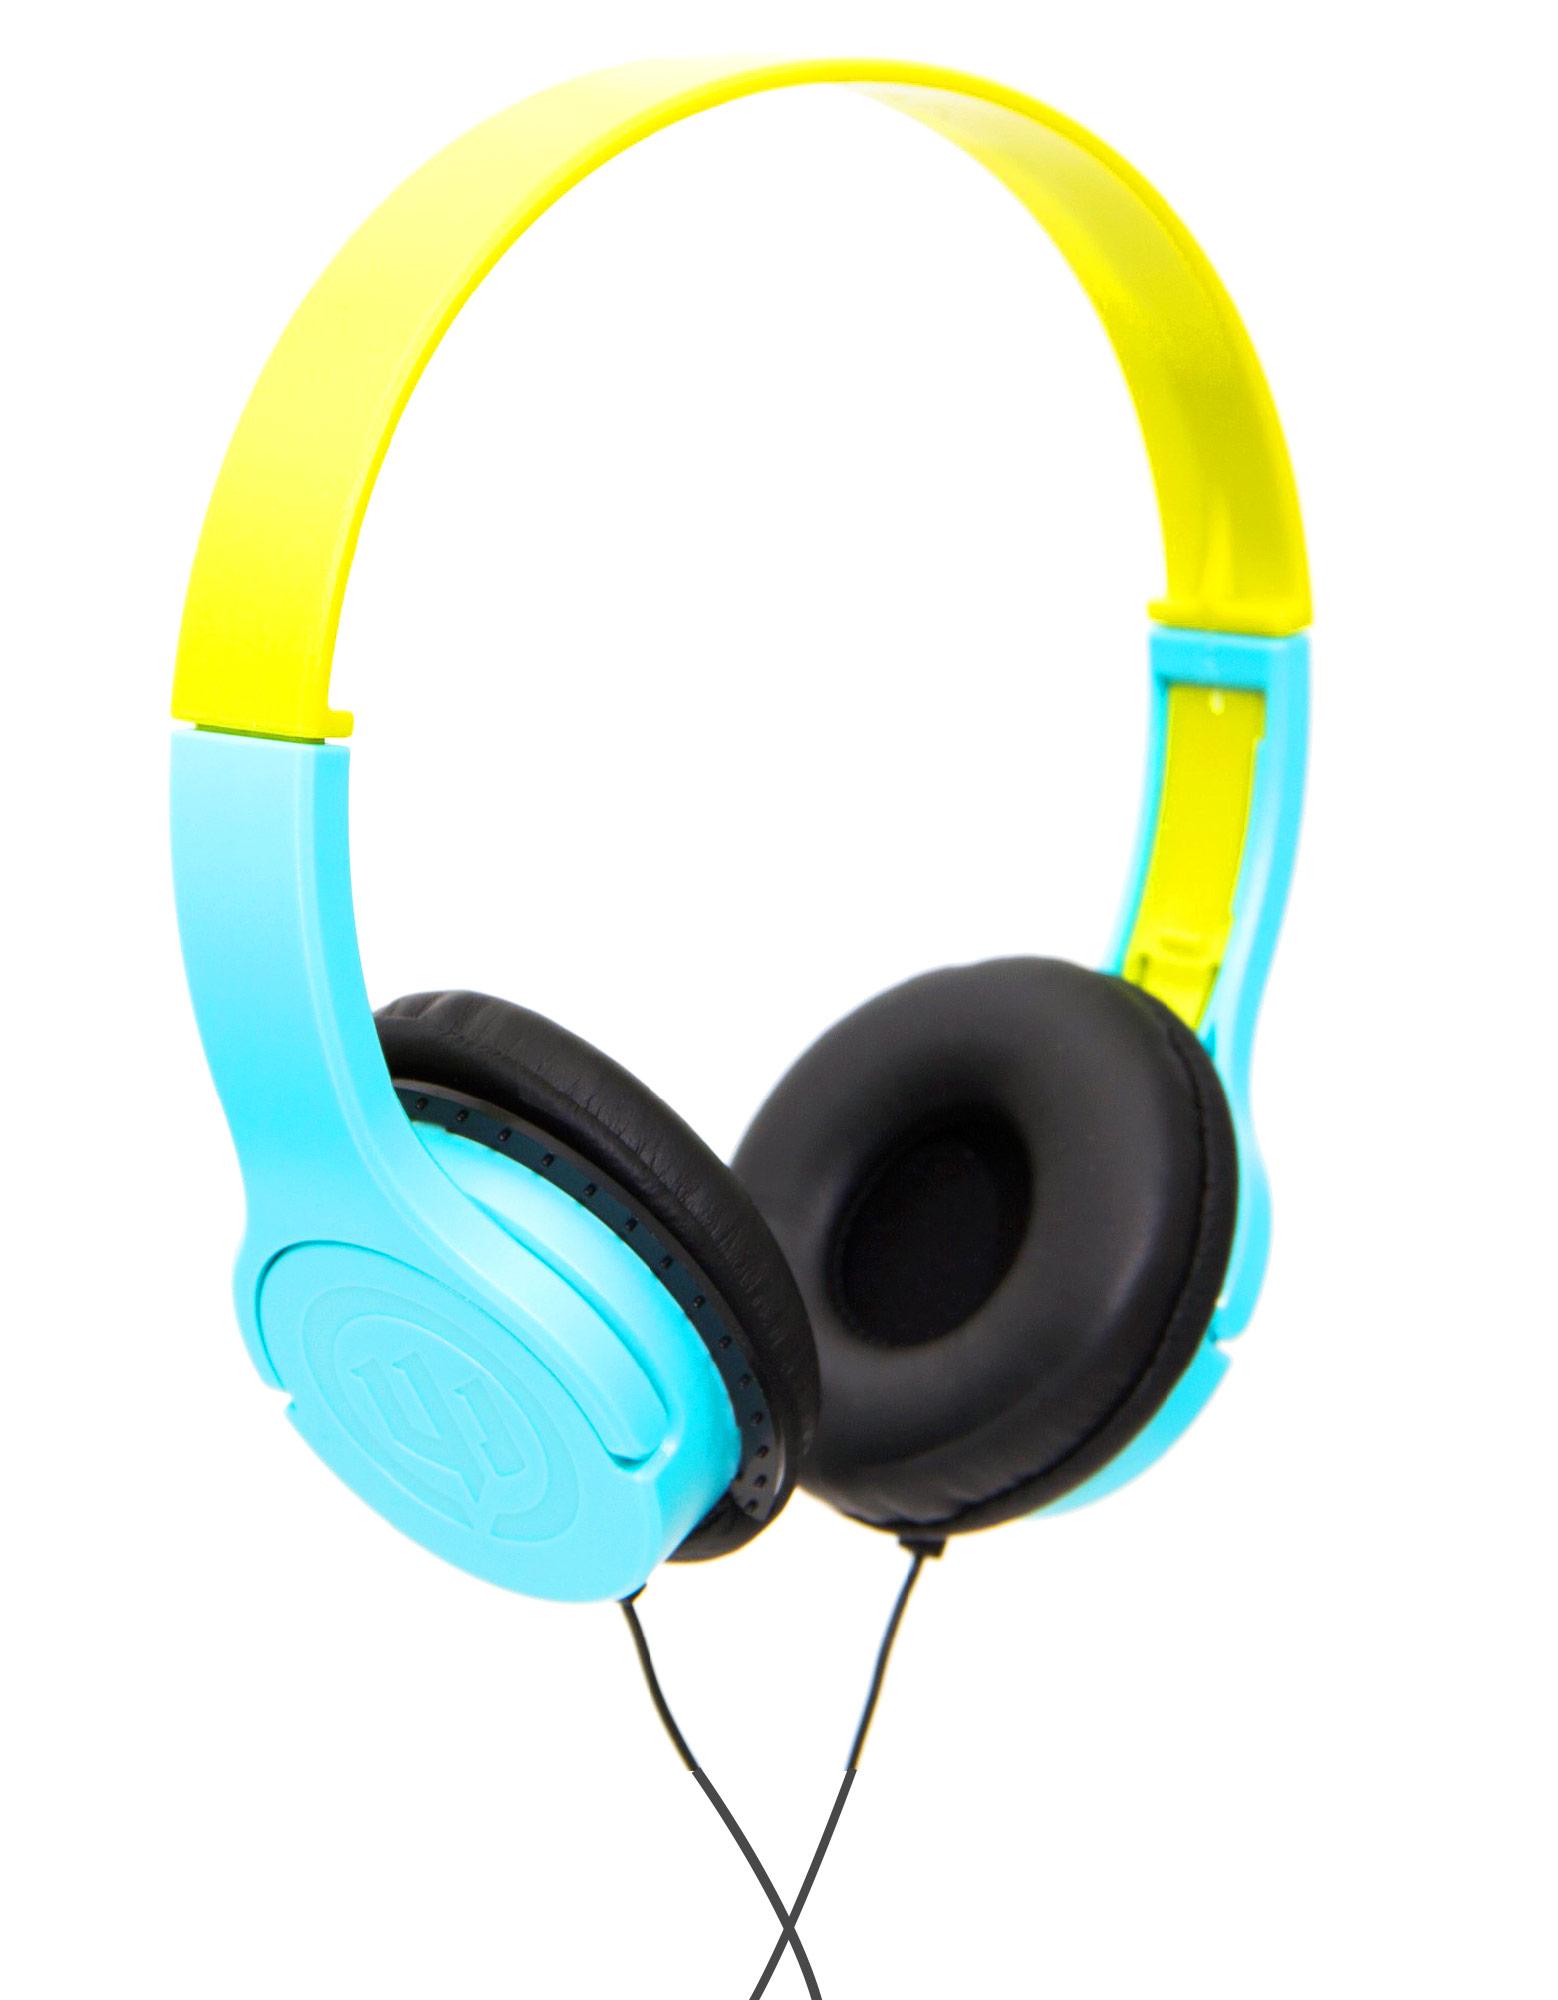 Wicked Audio Rad Rascal Sky Blue/Slime Kids Headphones